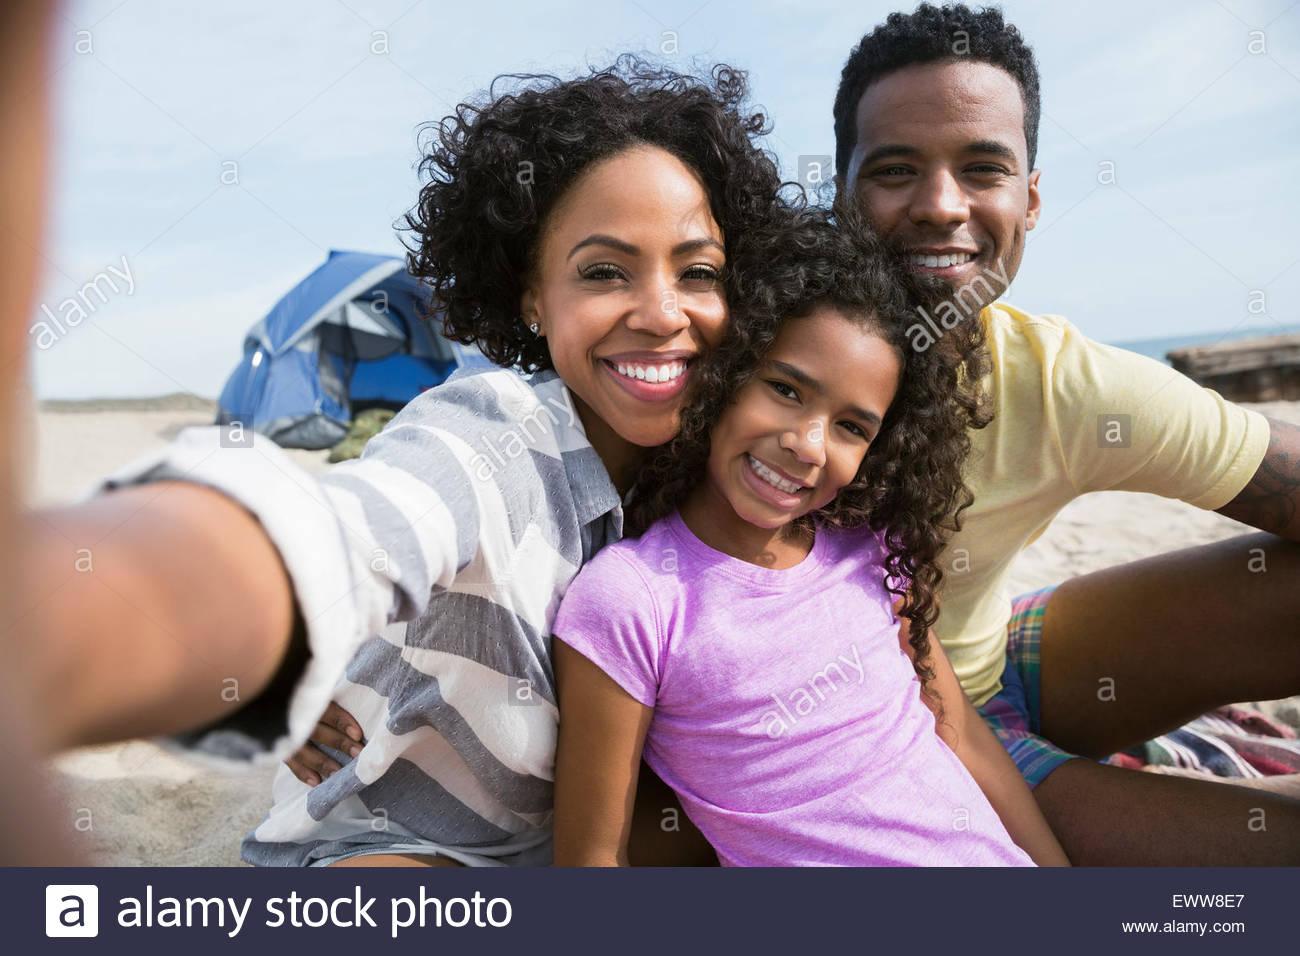 Portrait smiling family on beach - Stock Image